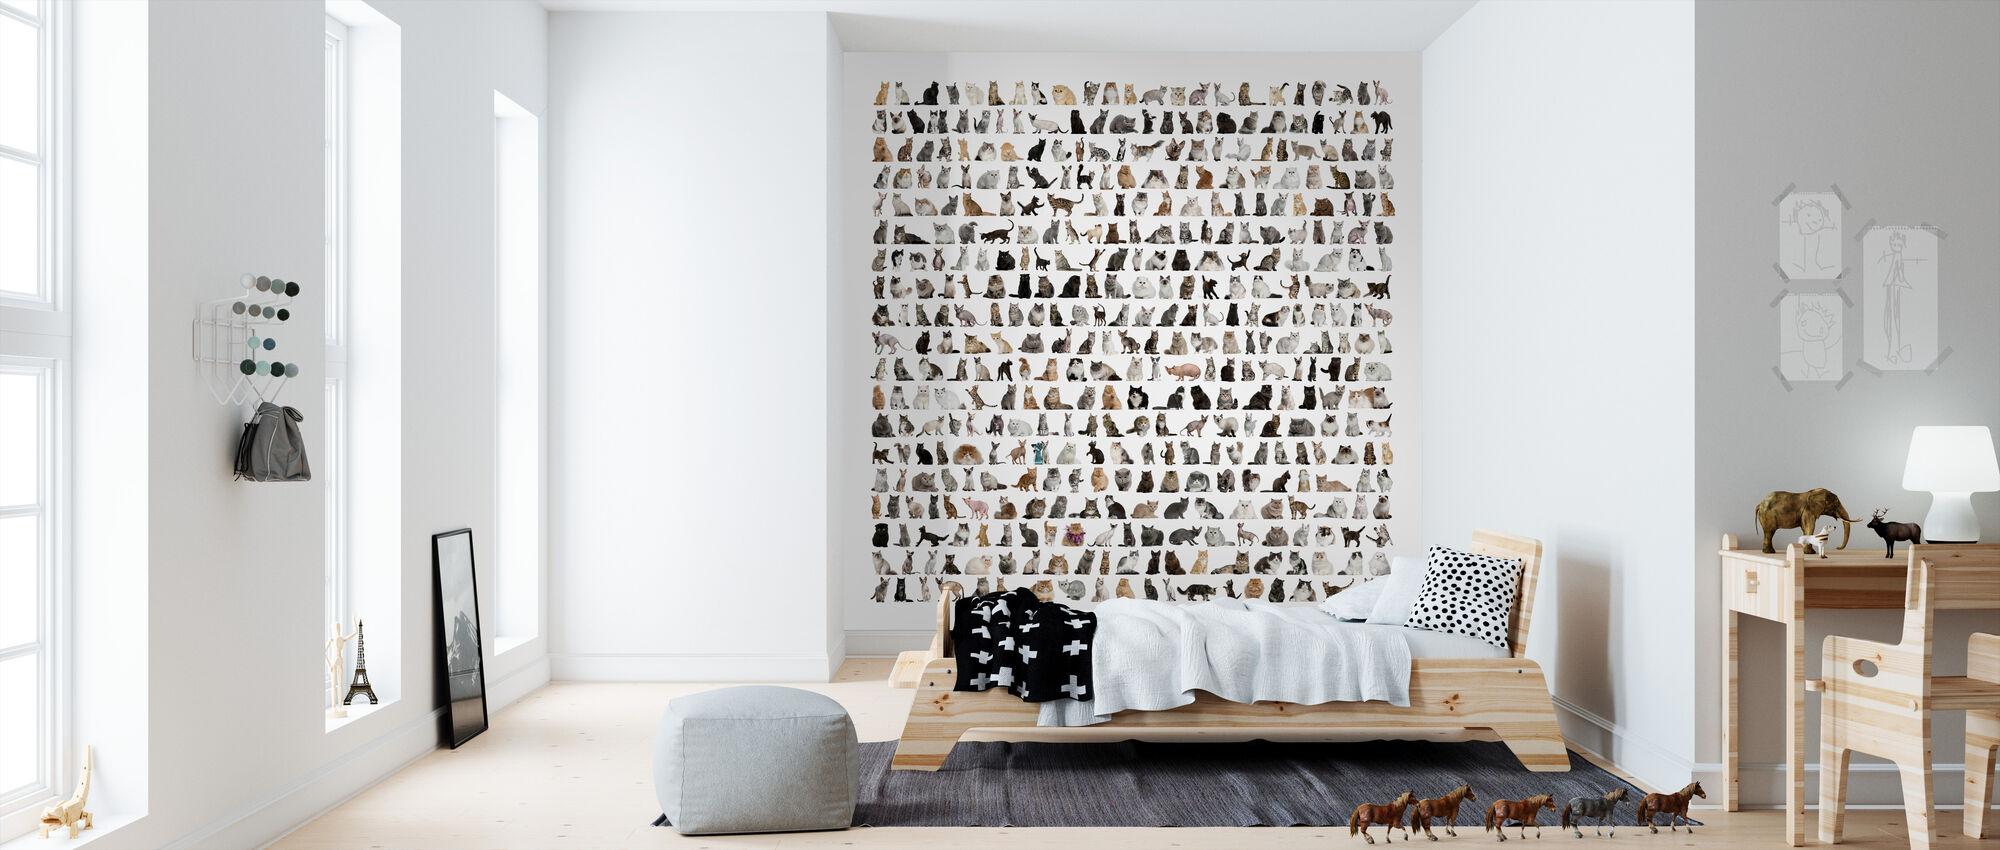 Catmania - Wallpaper - Kids Room